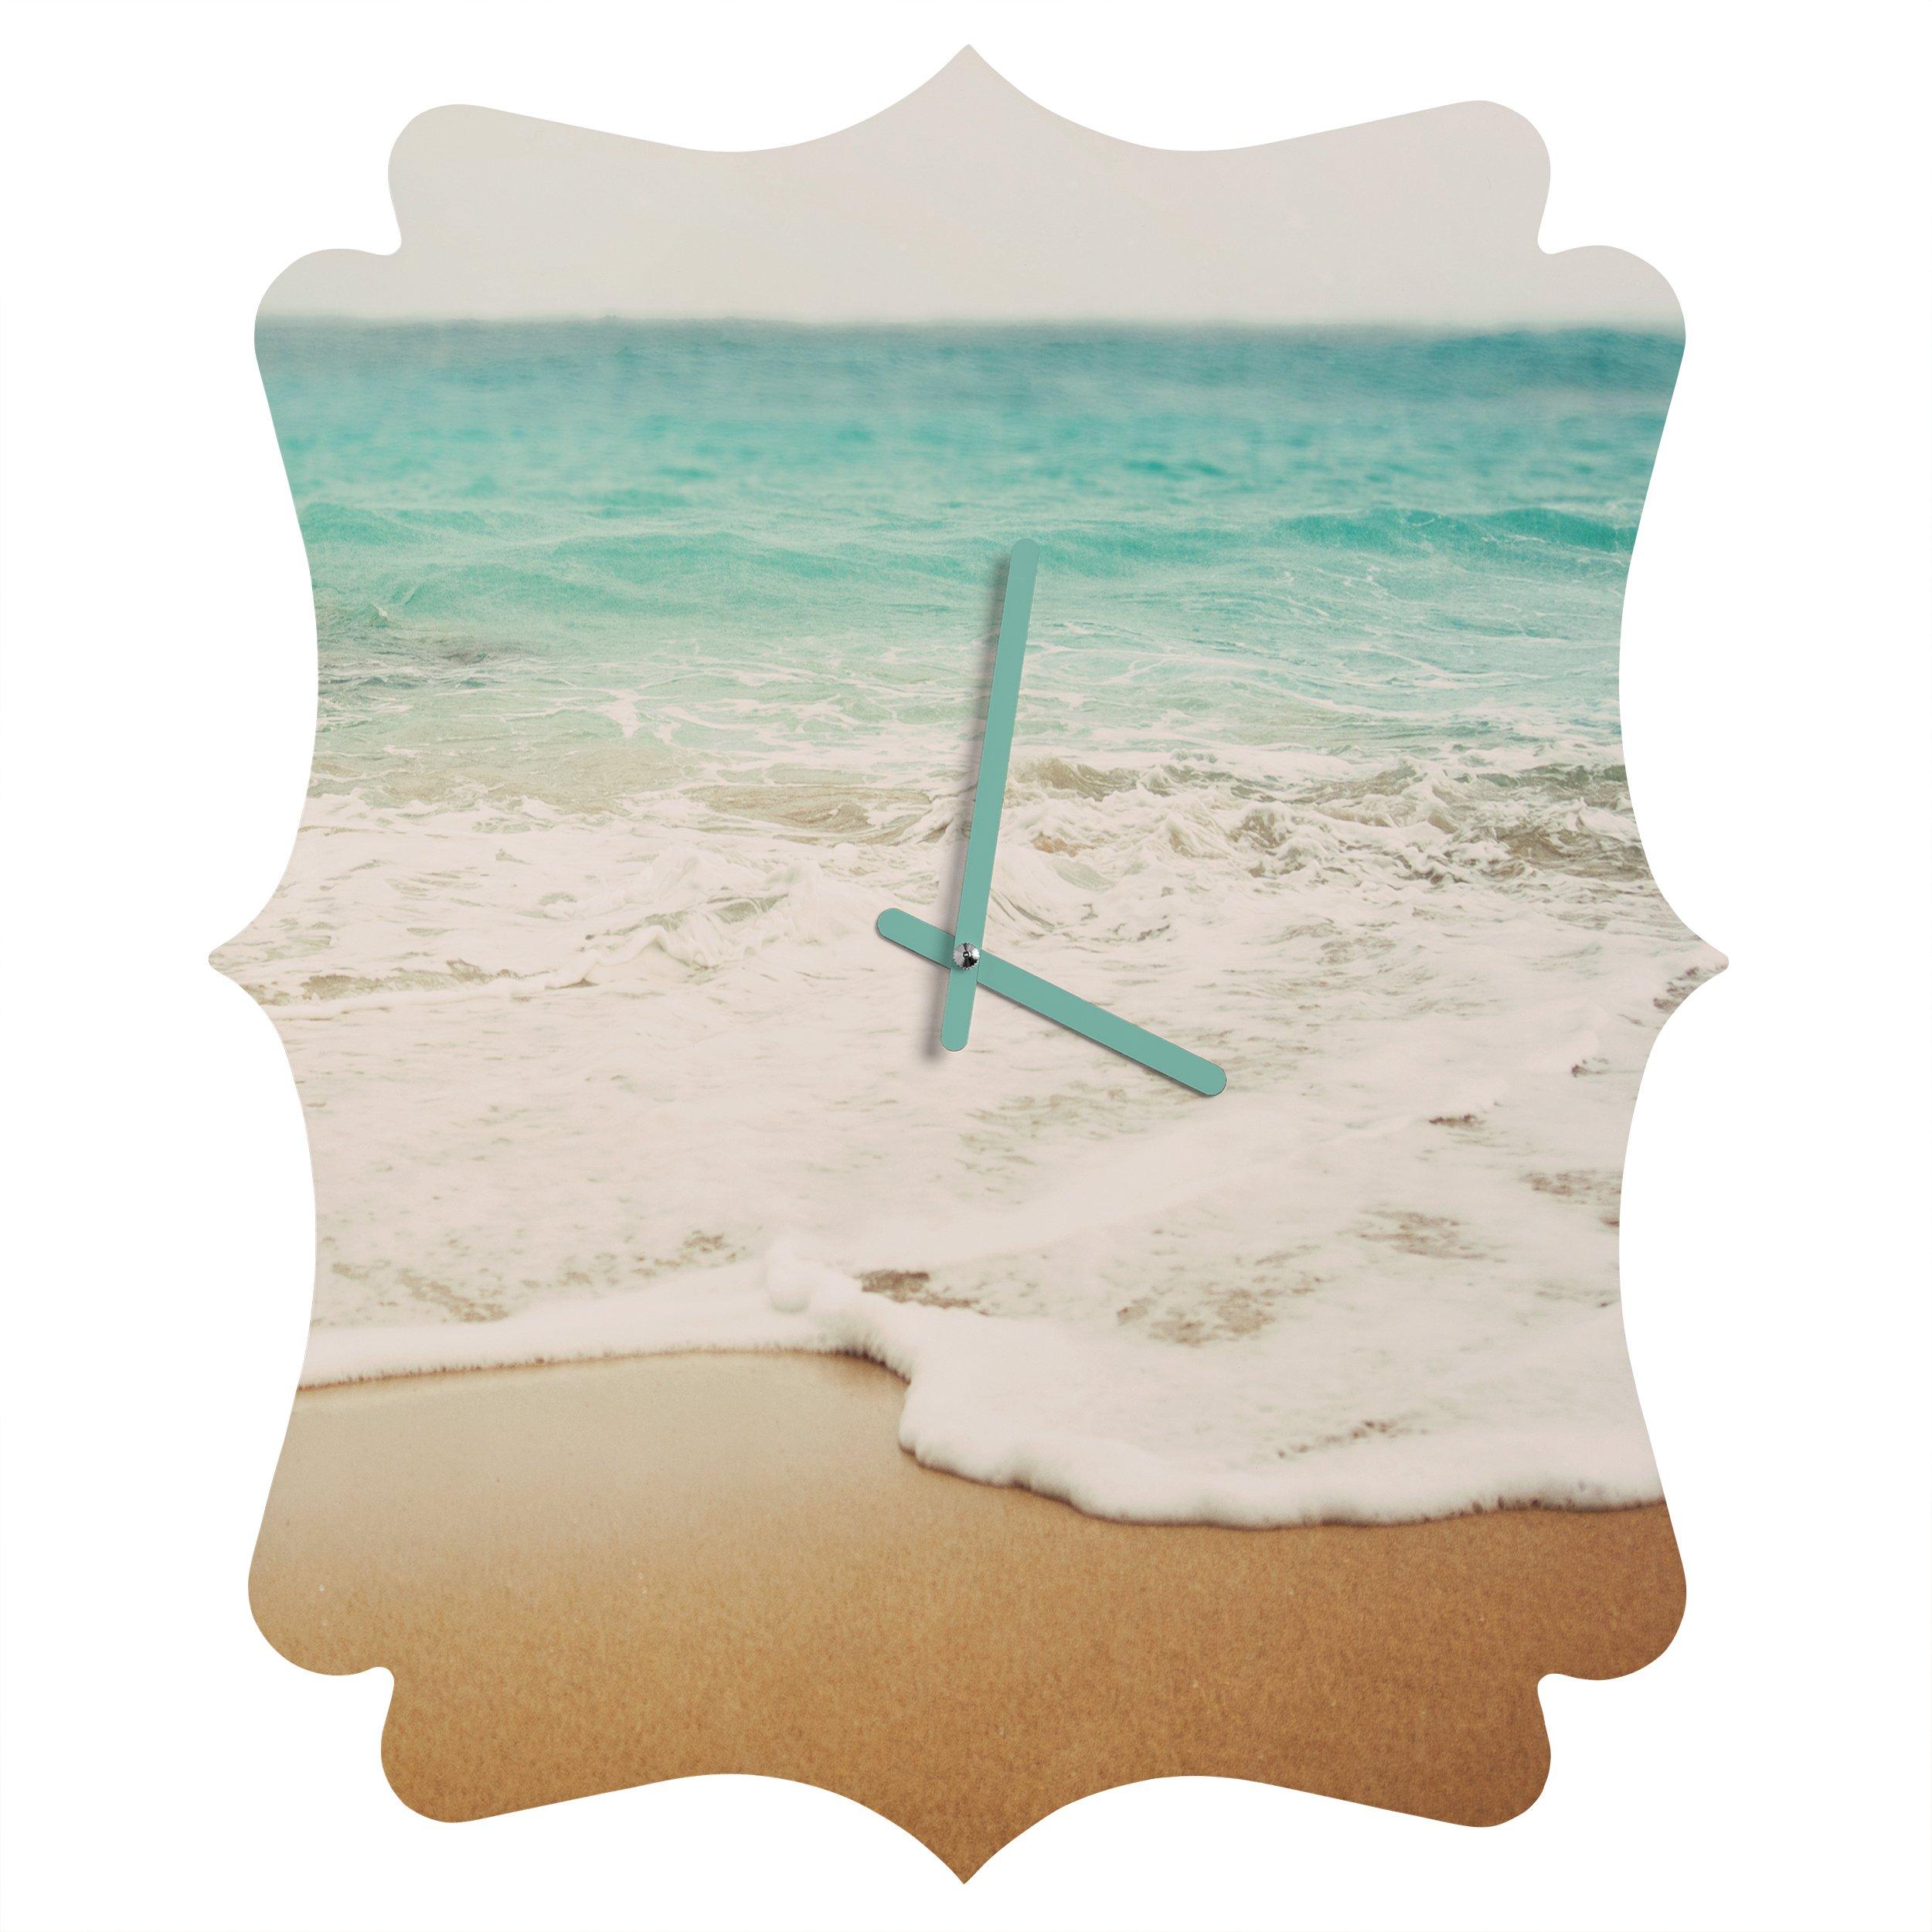 Deny Designs Bree Madden, Ombre Beach, Quatrefoil Clock, Small